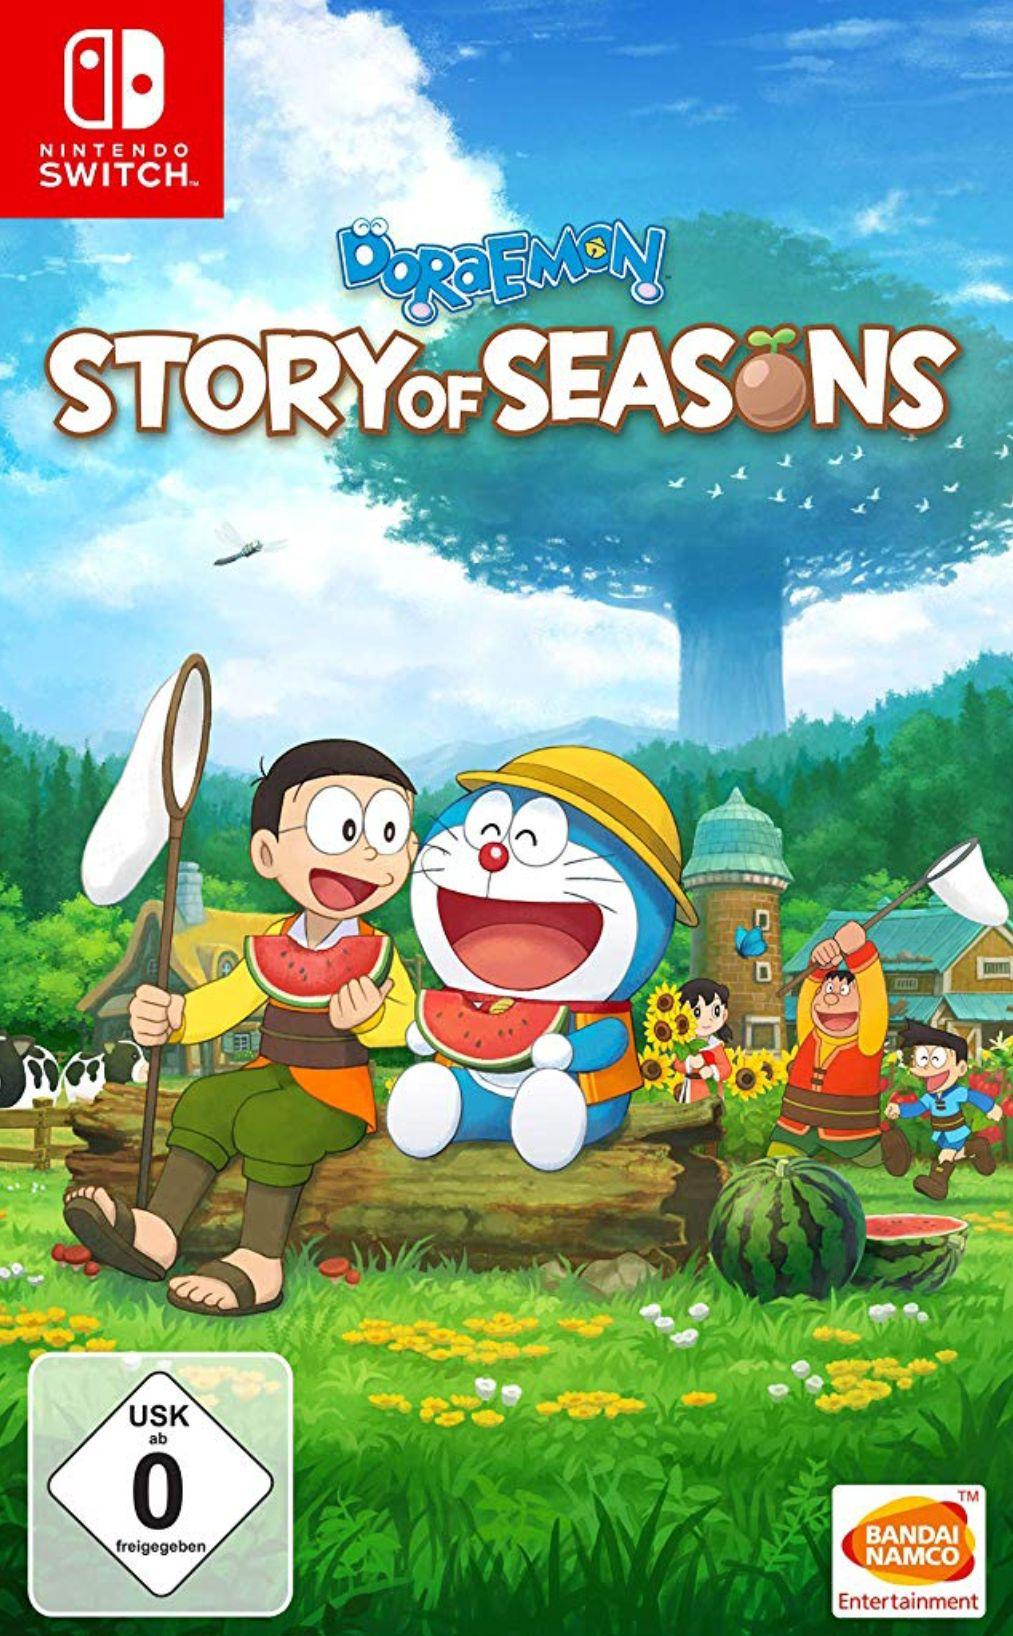 Doraemon Story of Seasons - Nintendo Switch [Importación alemana] Minimo histórico